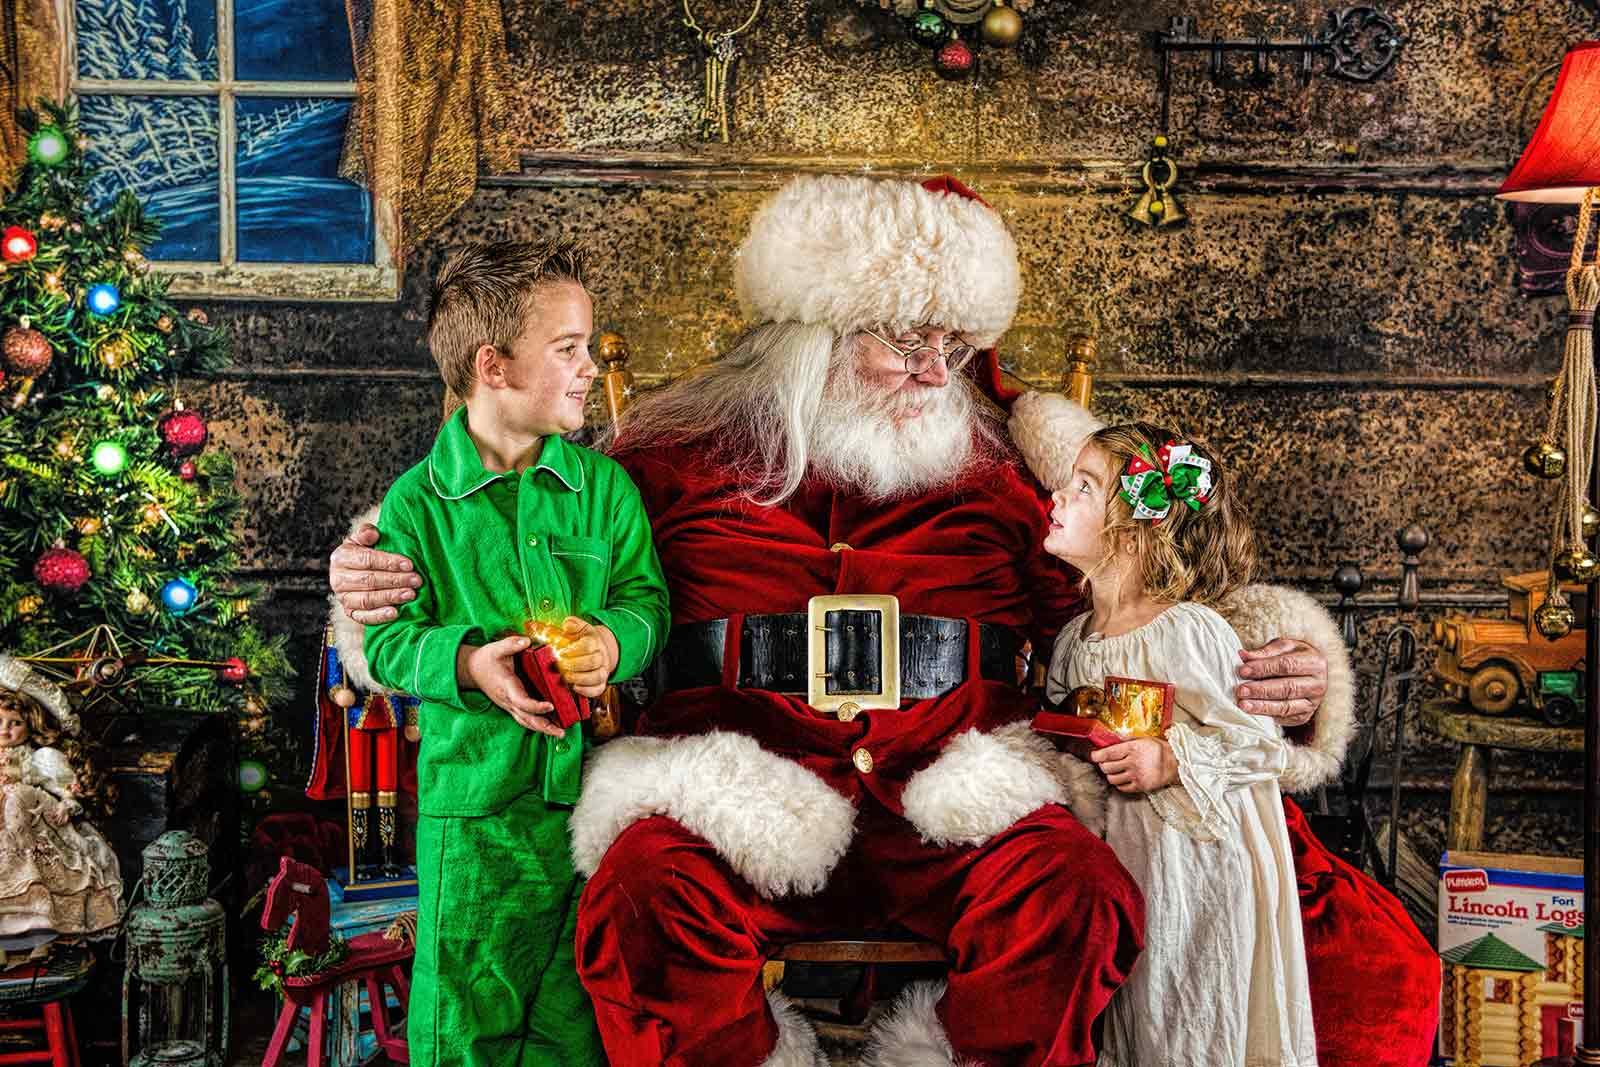 017_Magic-of-Santa-Anna-Thielen-Photography